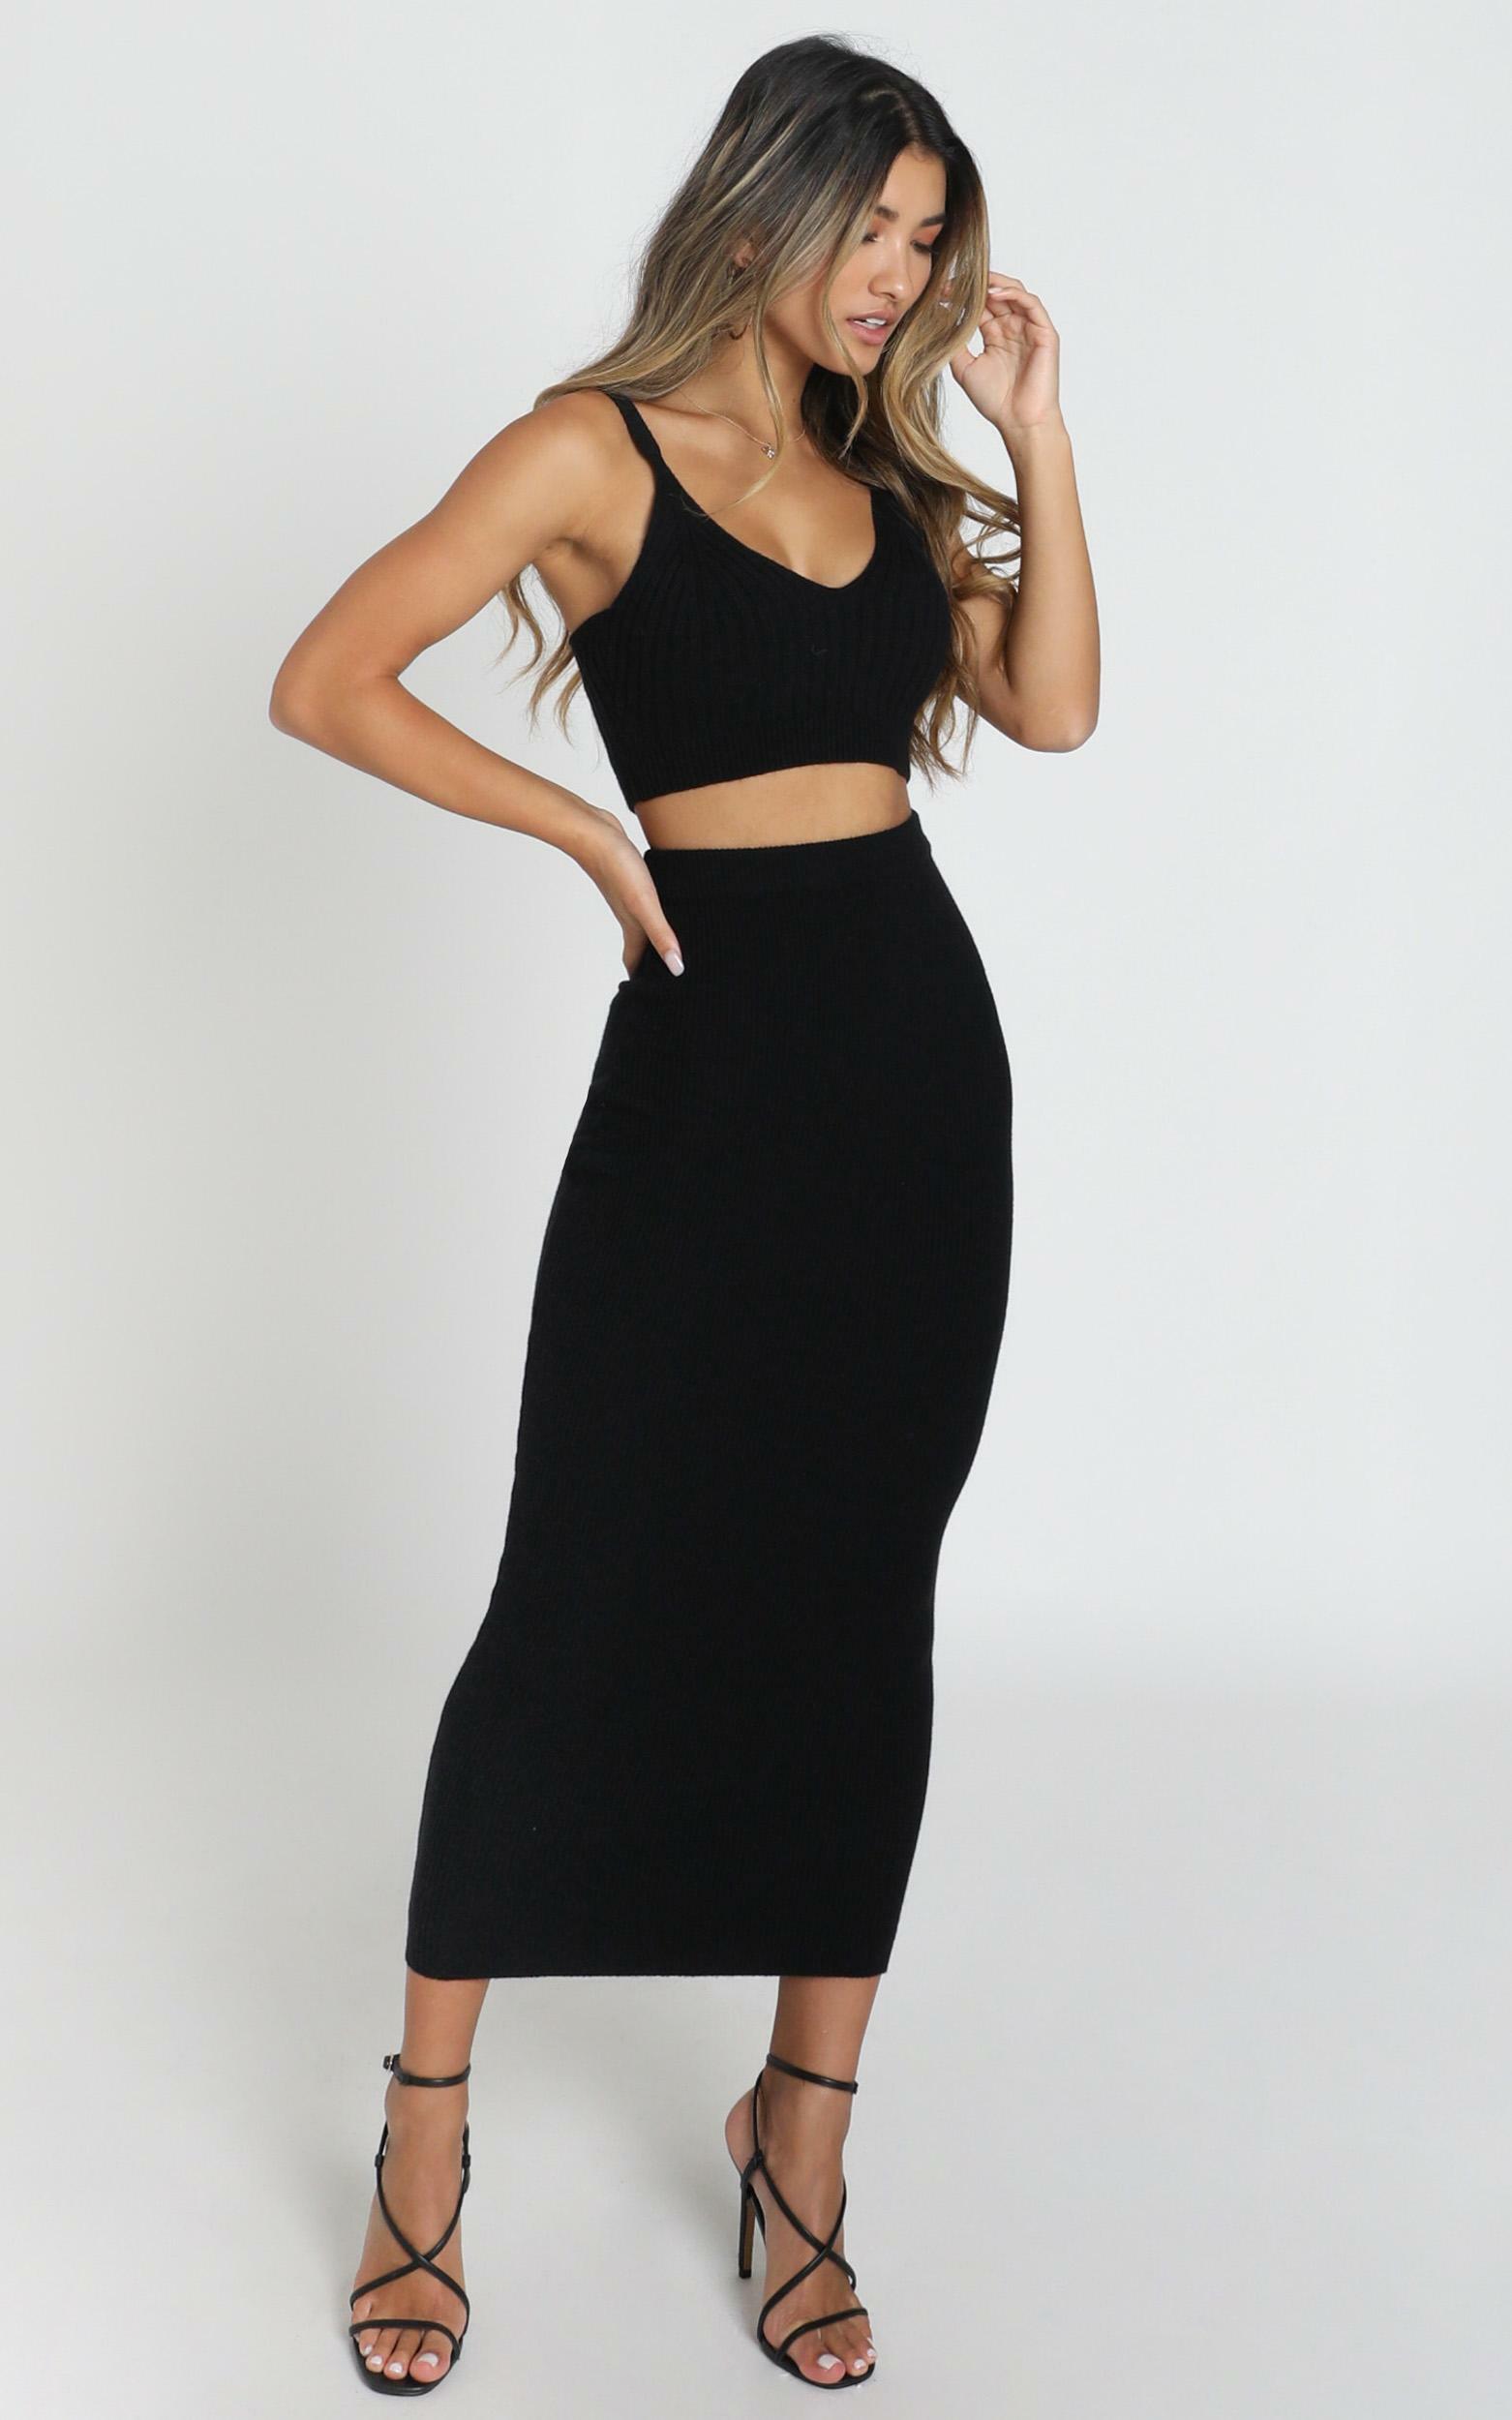 Jessie Knit Skirt in black rib - 6 (XS), Black, hi-res image number null